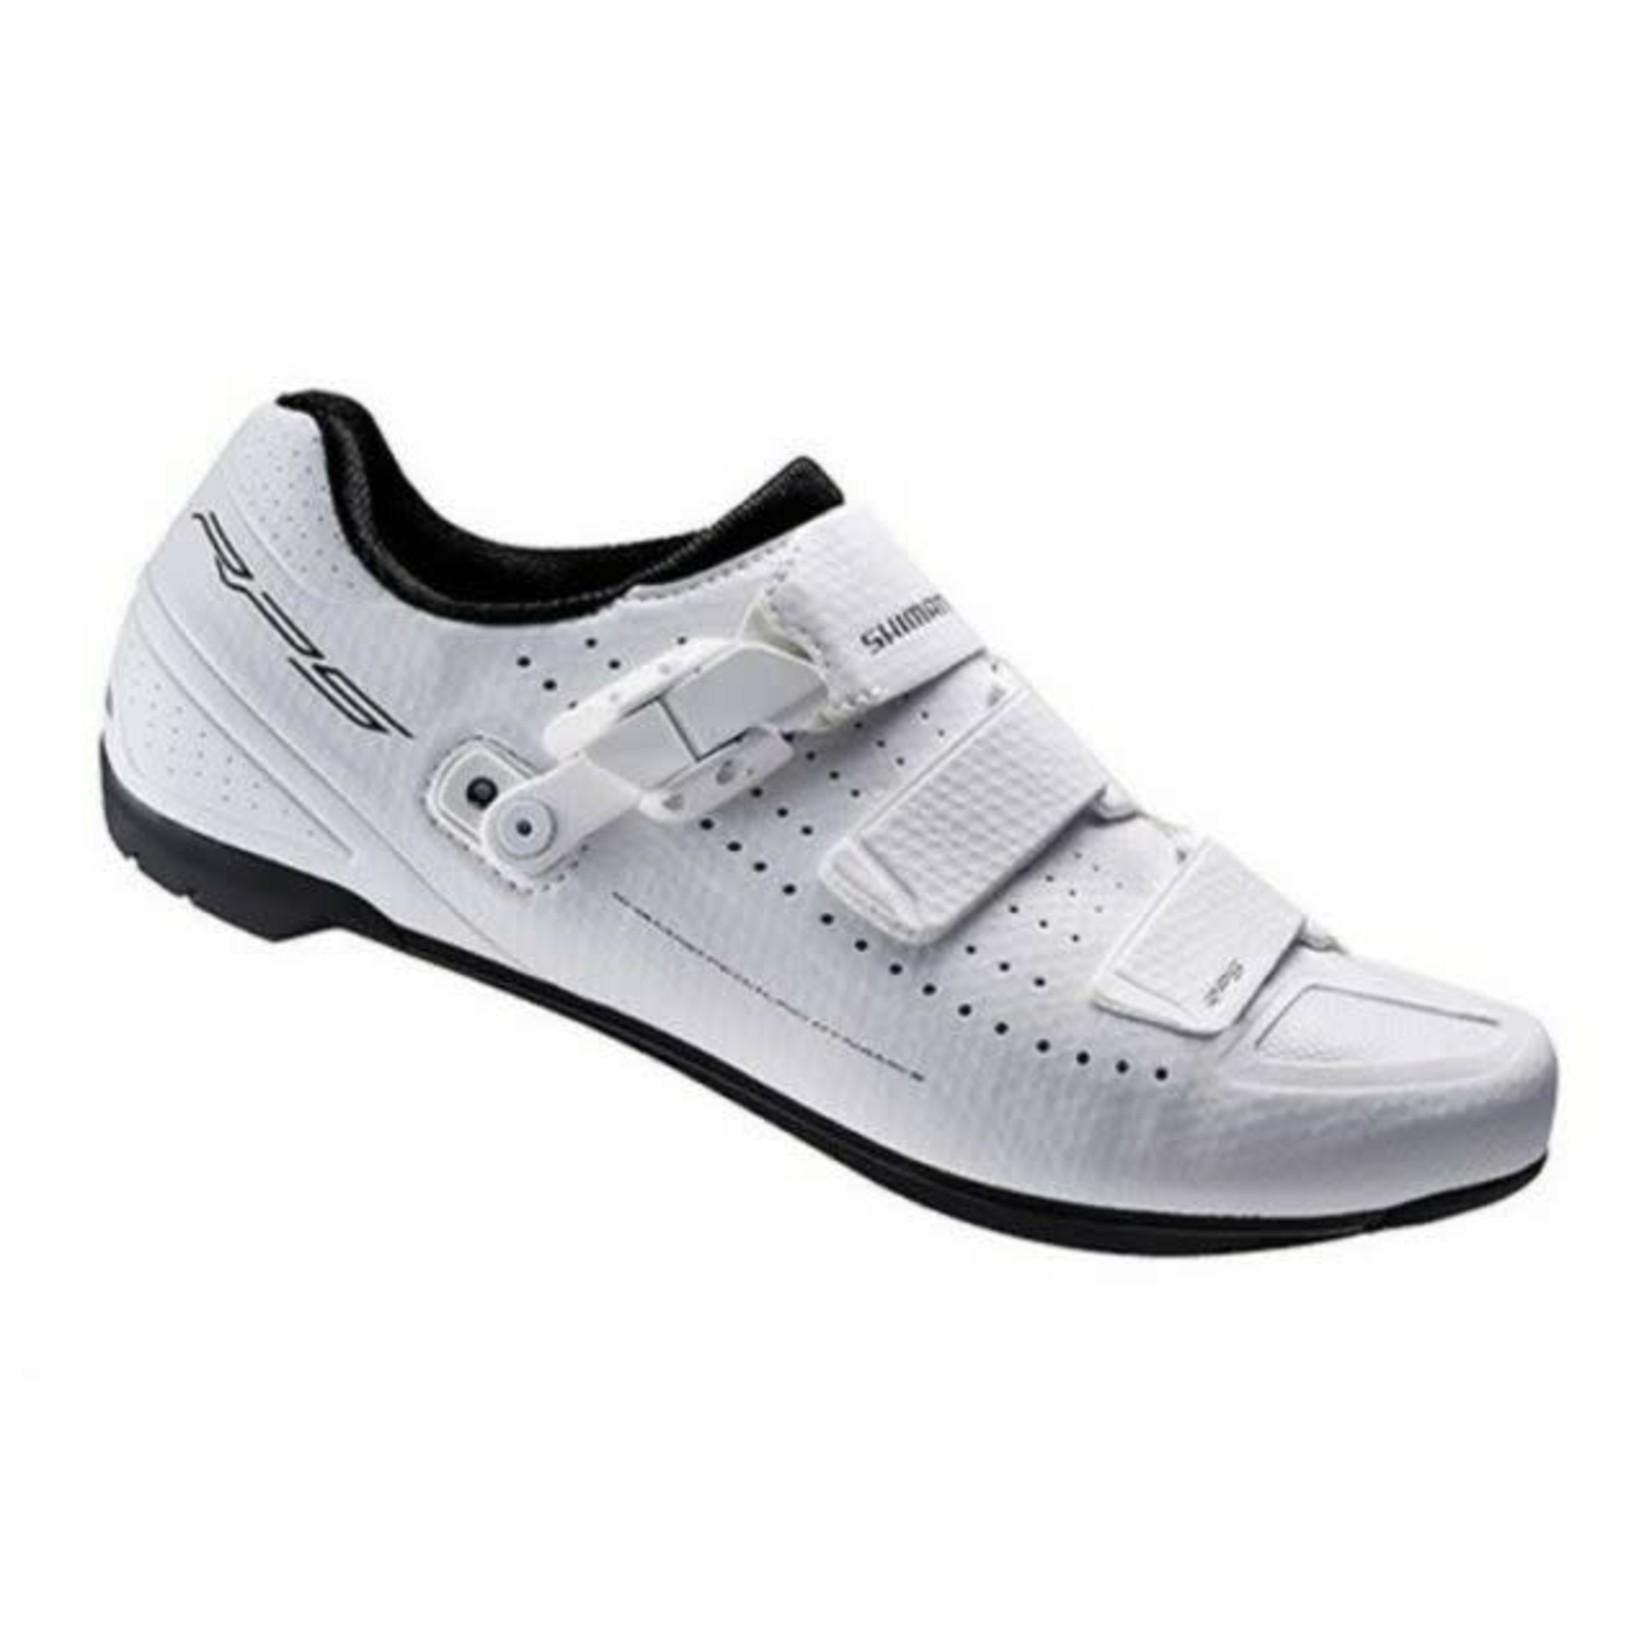 Shimano Shimano RP9 SPD SL Road Cycling Shoes  White 44